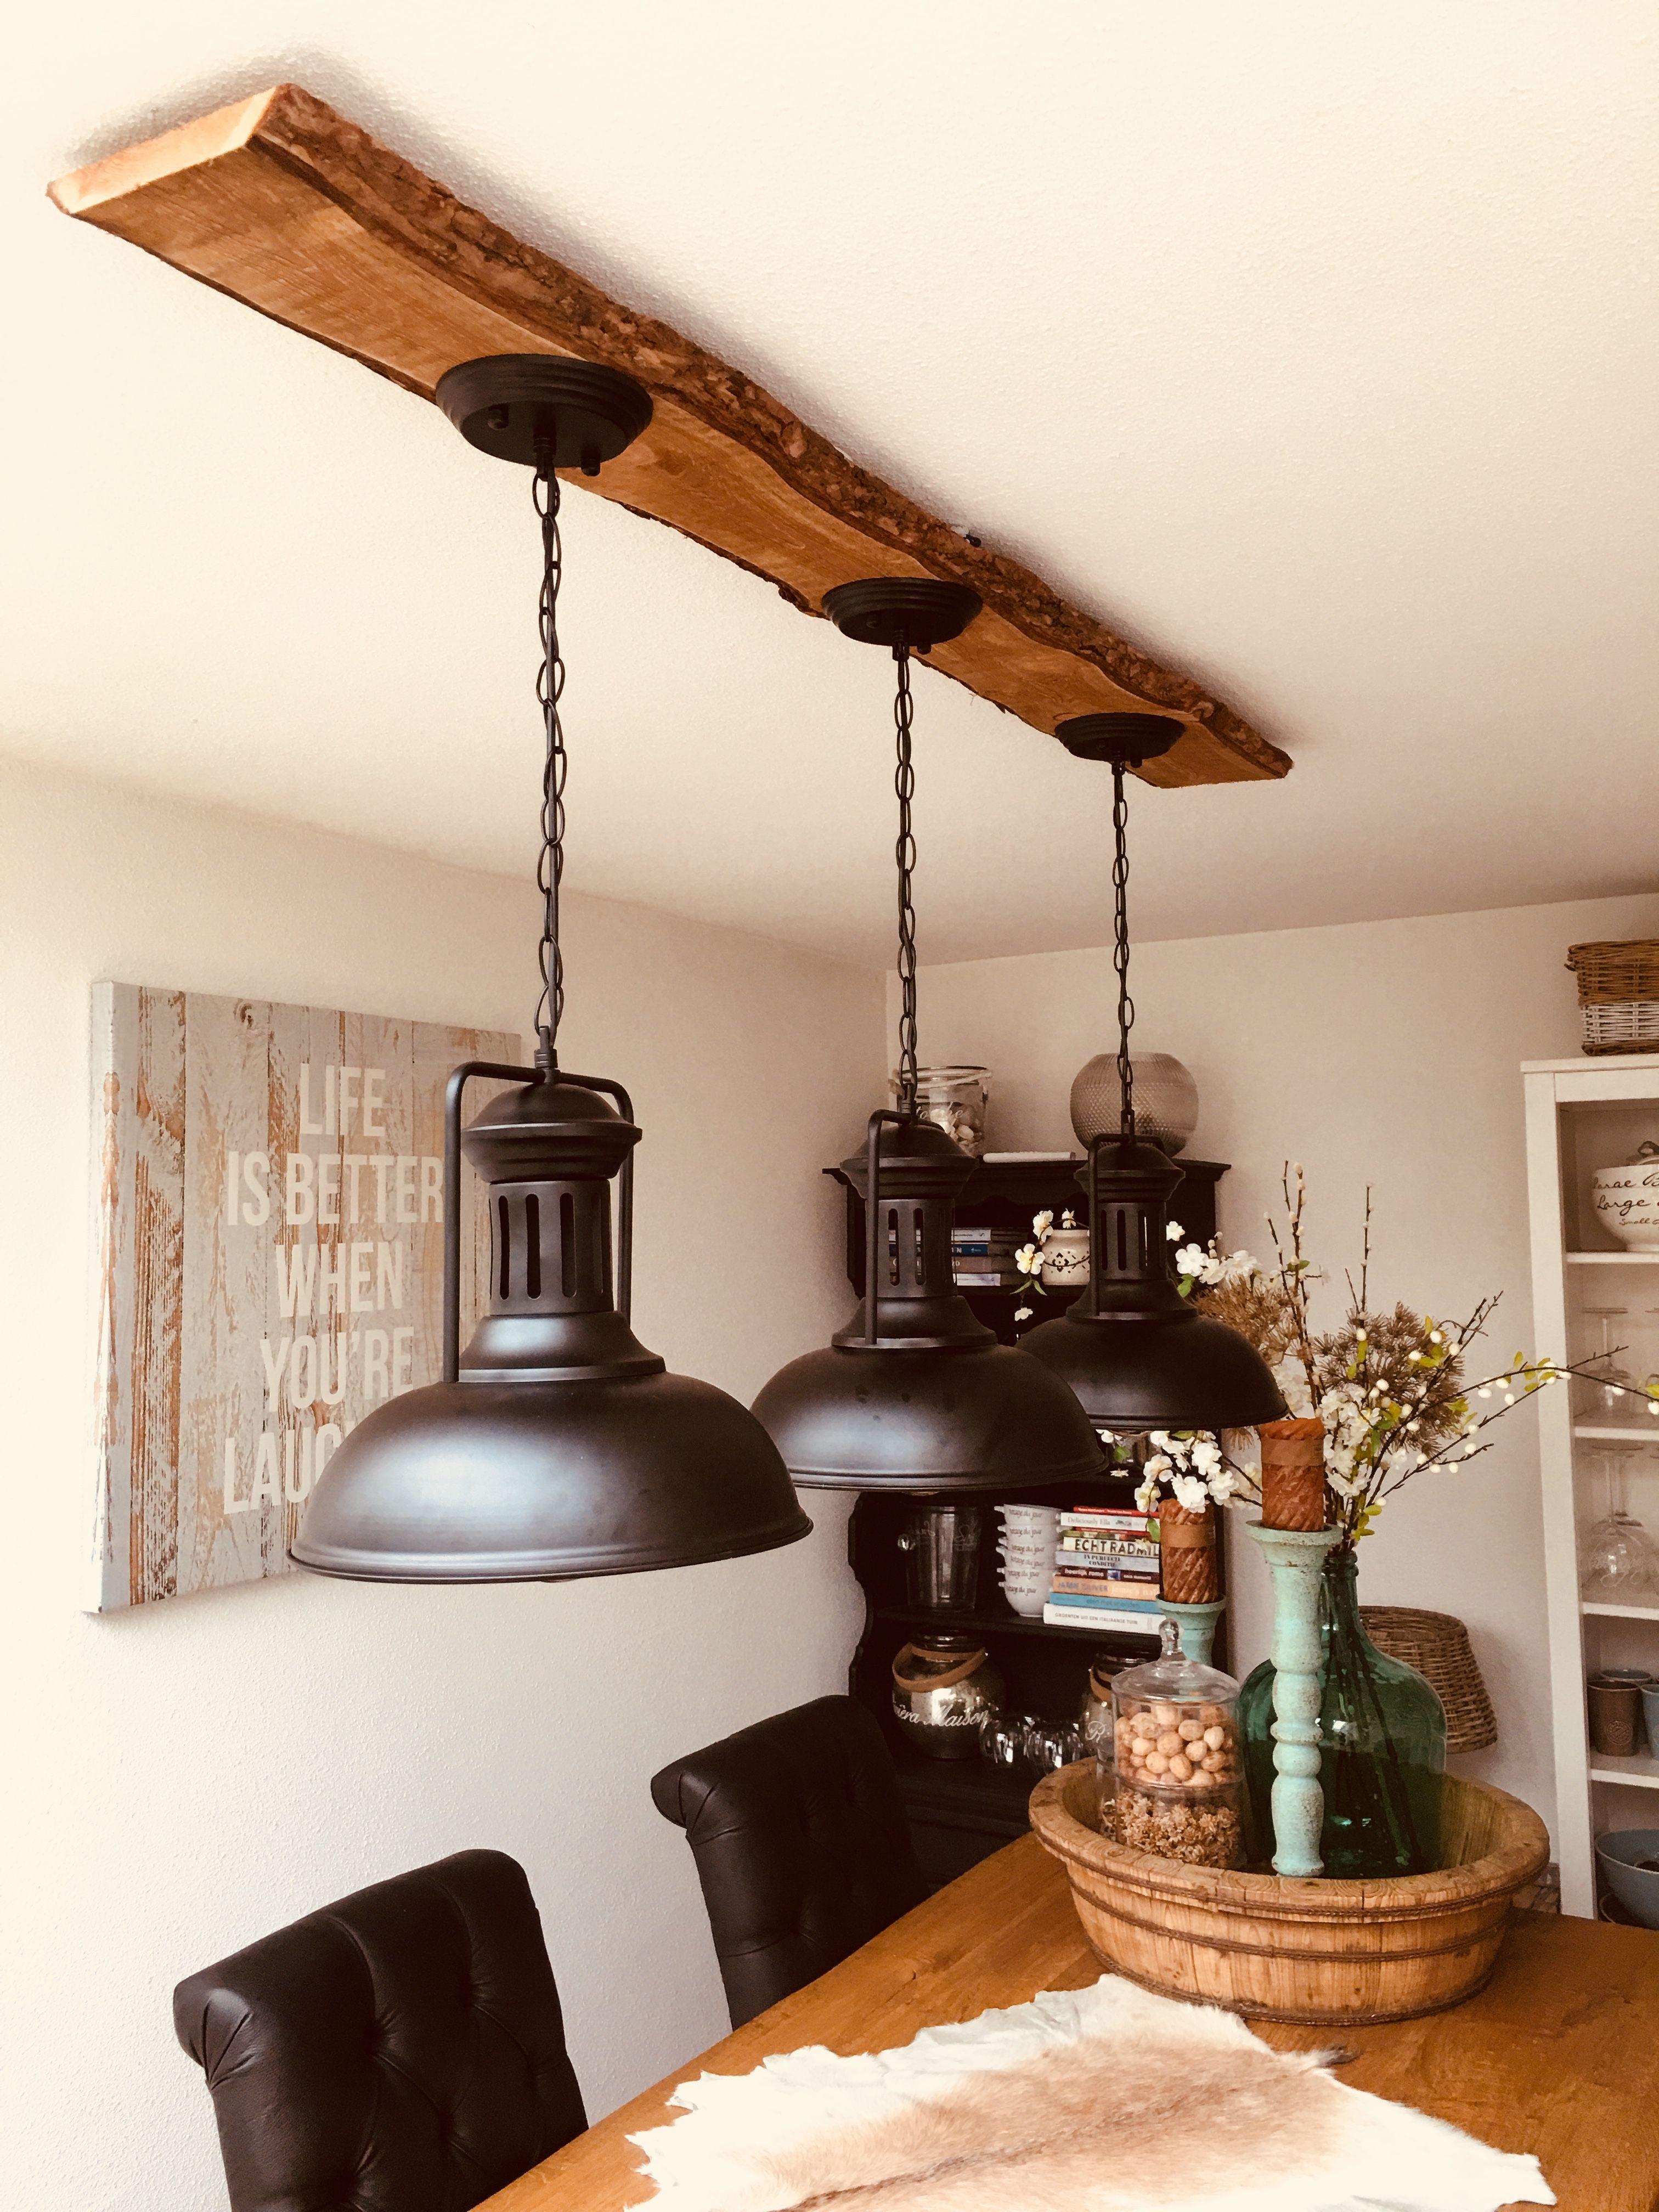 pinsylvia darley on fixer upper ideas | farmhouse